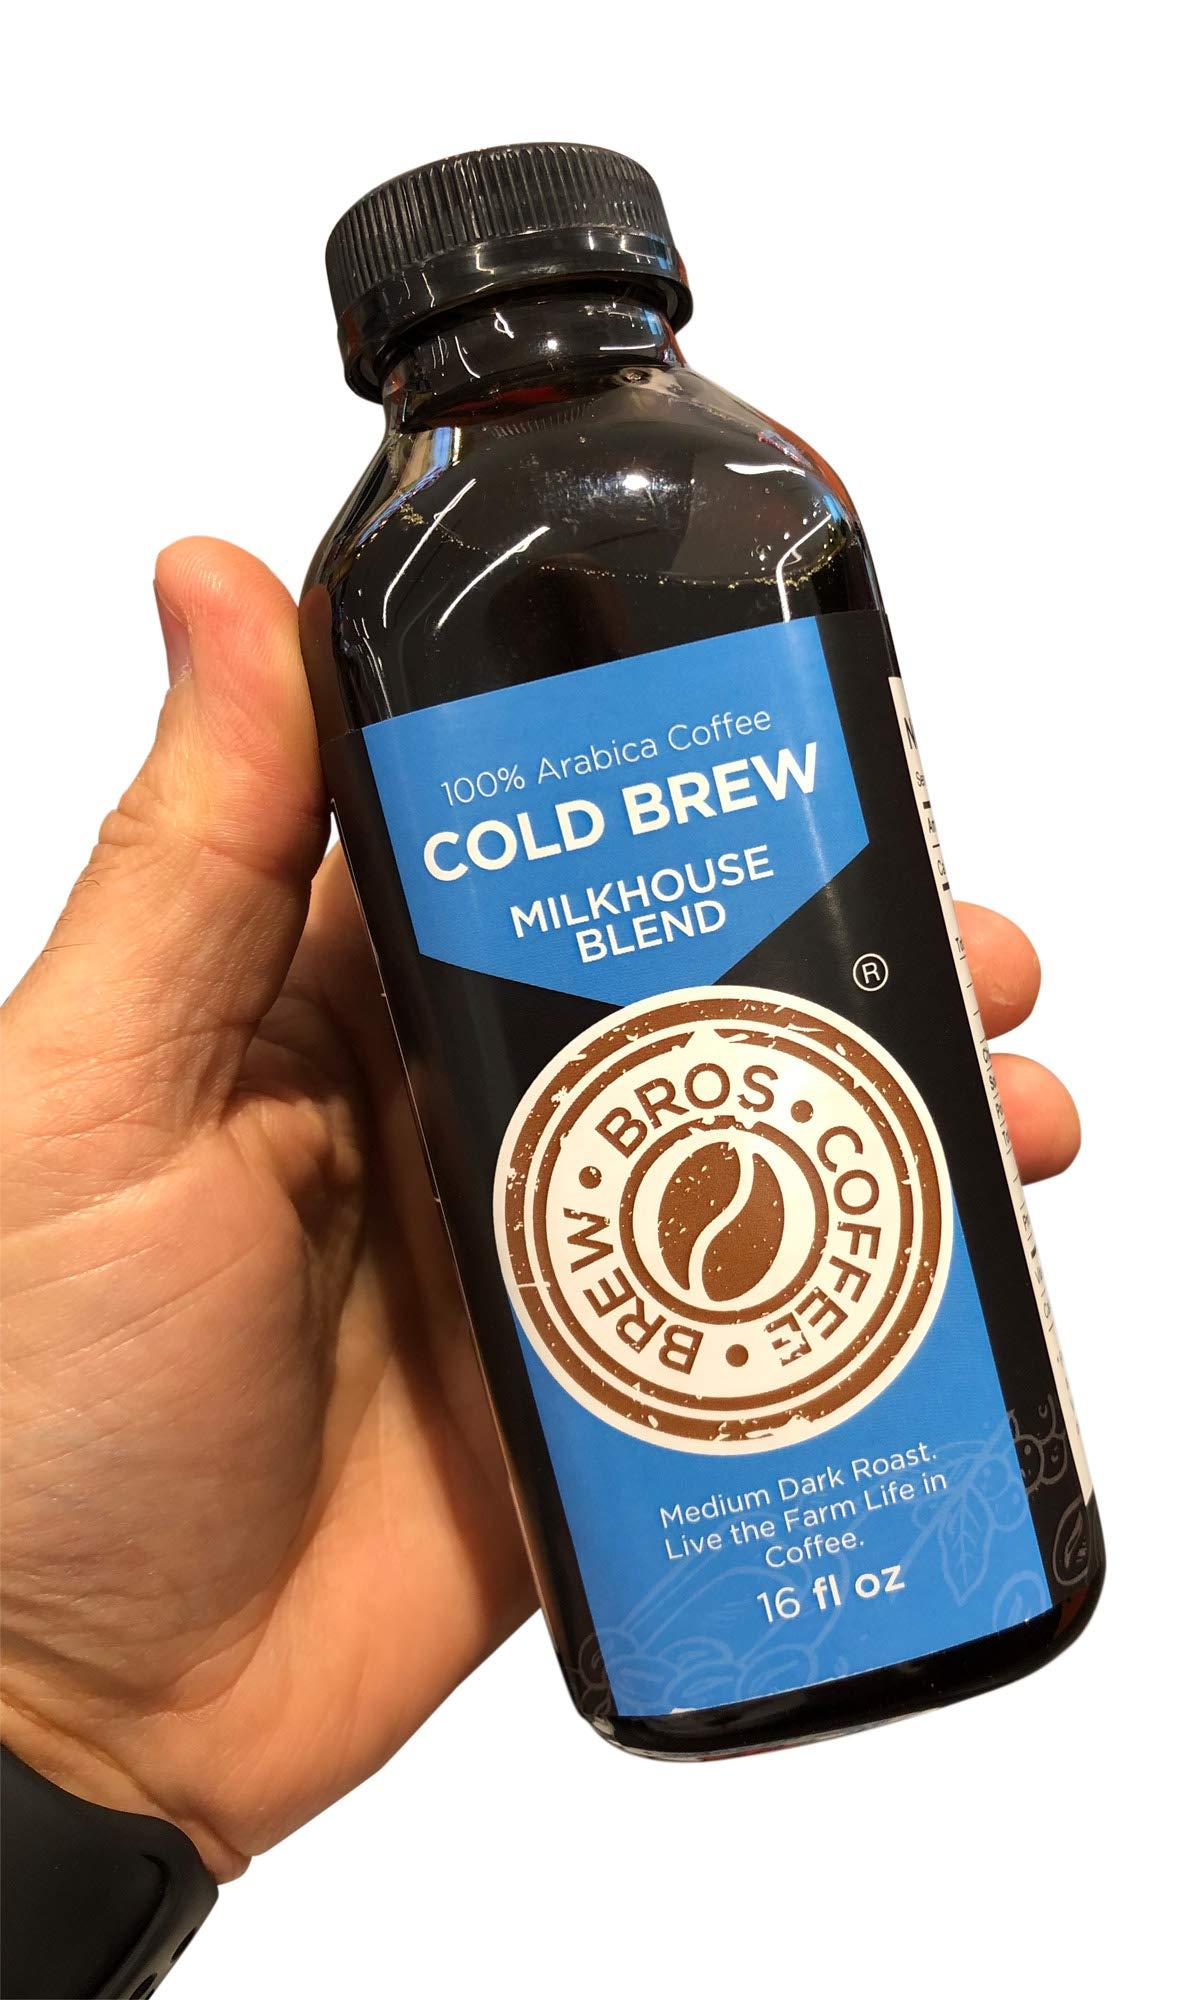 Artisan Small Batch Roasted 16 hour Brew Milkhouse COLD Brew Bros 16oz 8 pack Medium Dark Roast